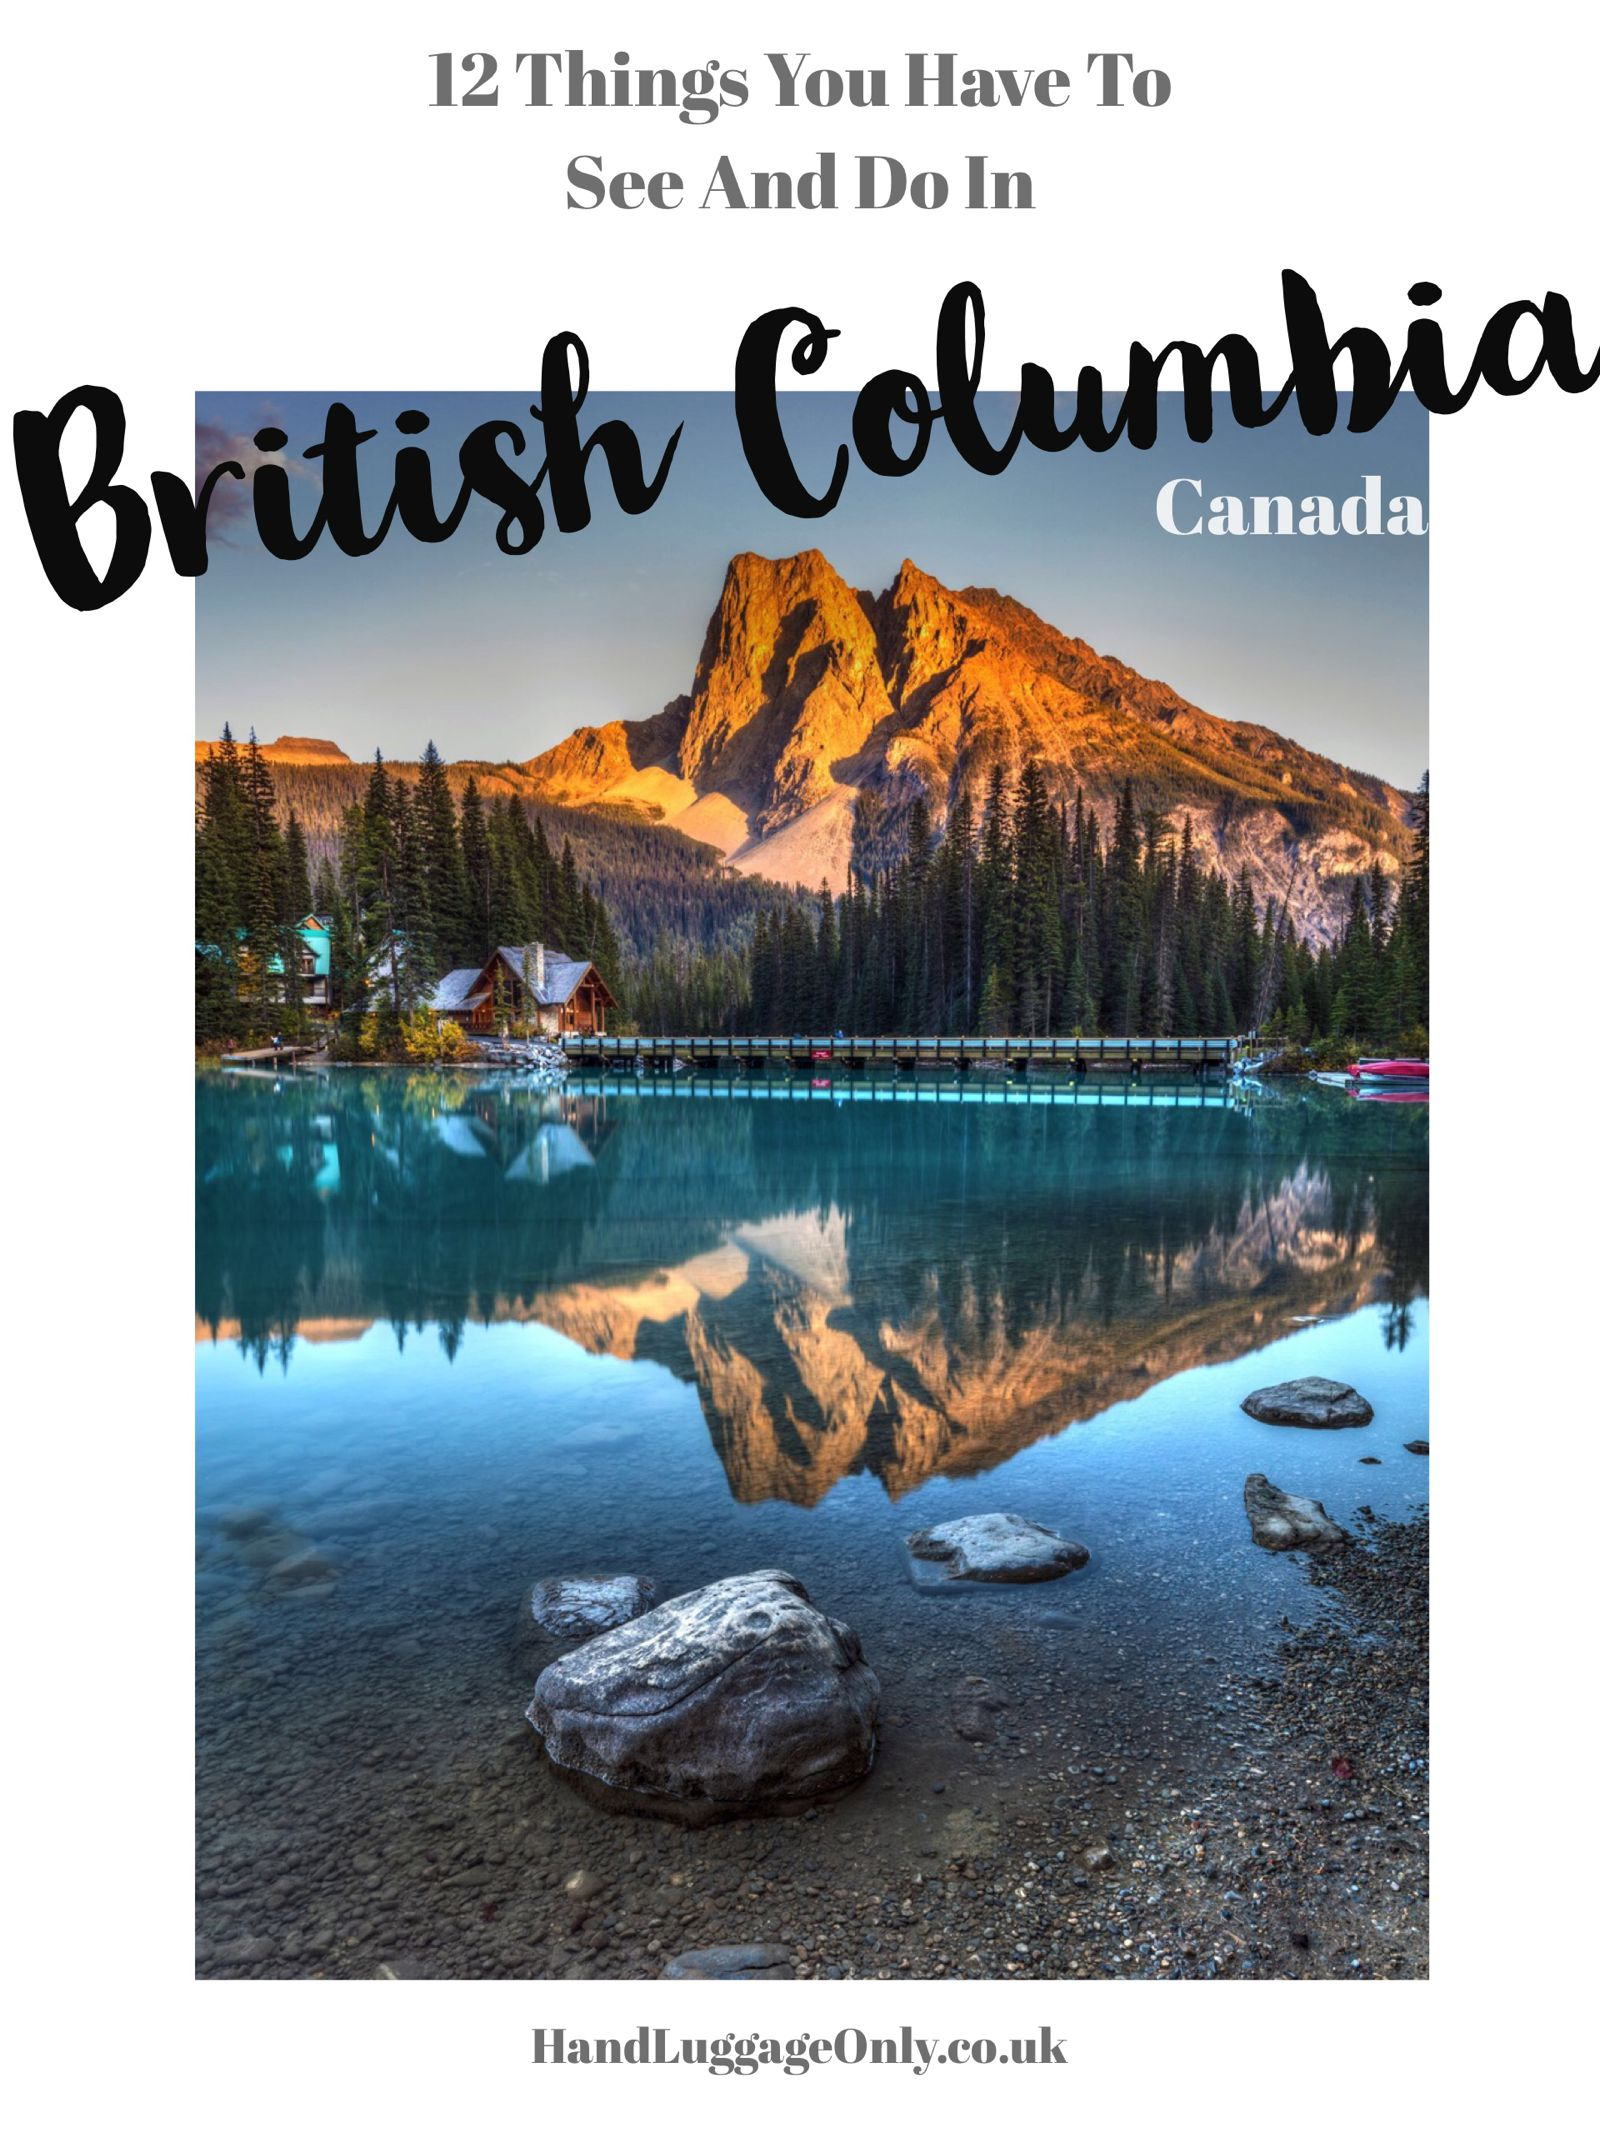 12 Beautiful Places To Visit in British Columbia, Canada (20)